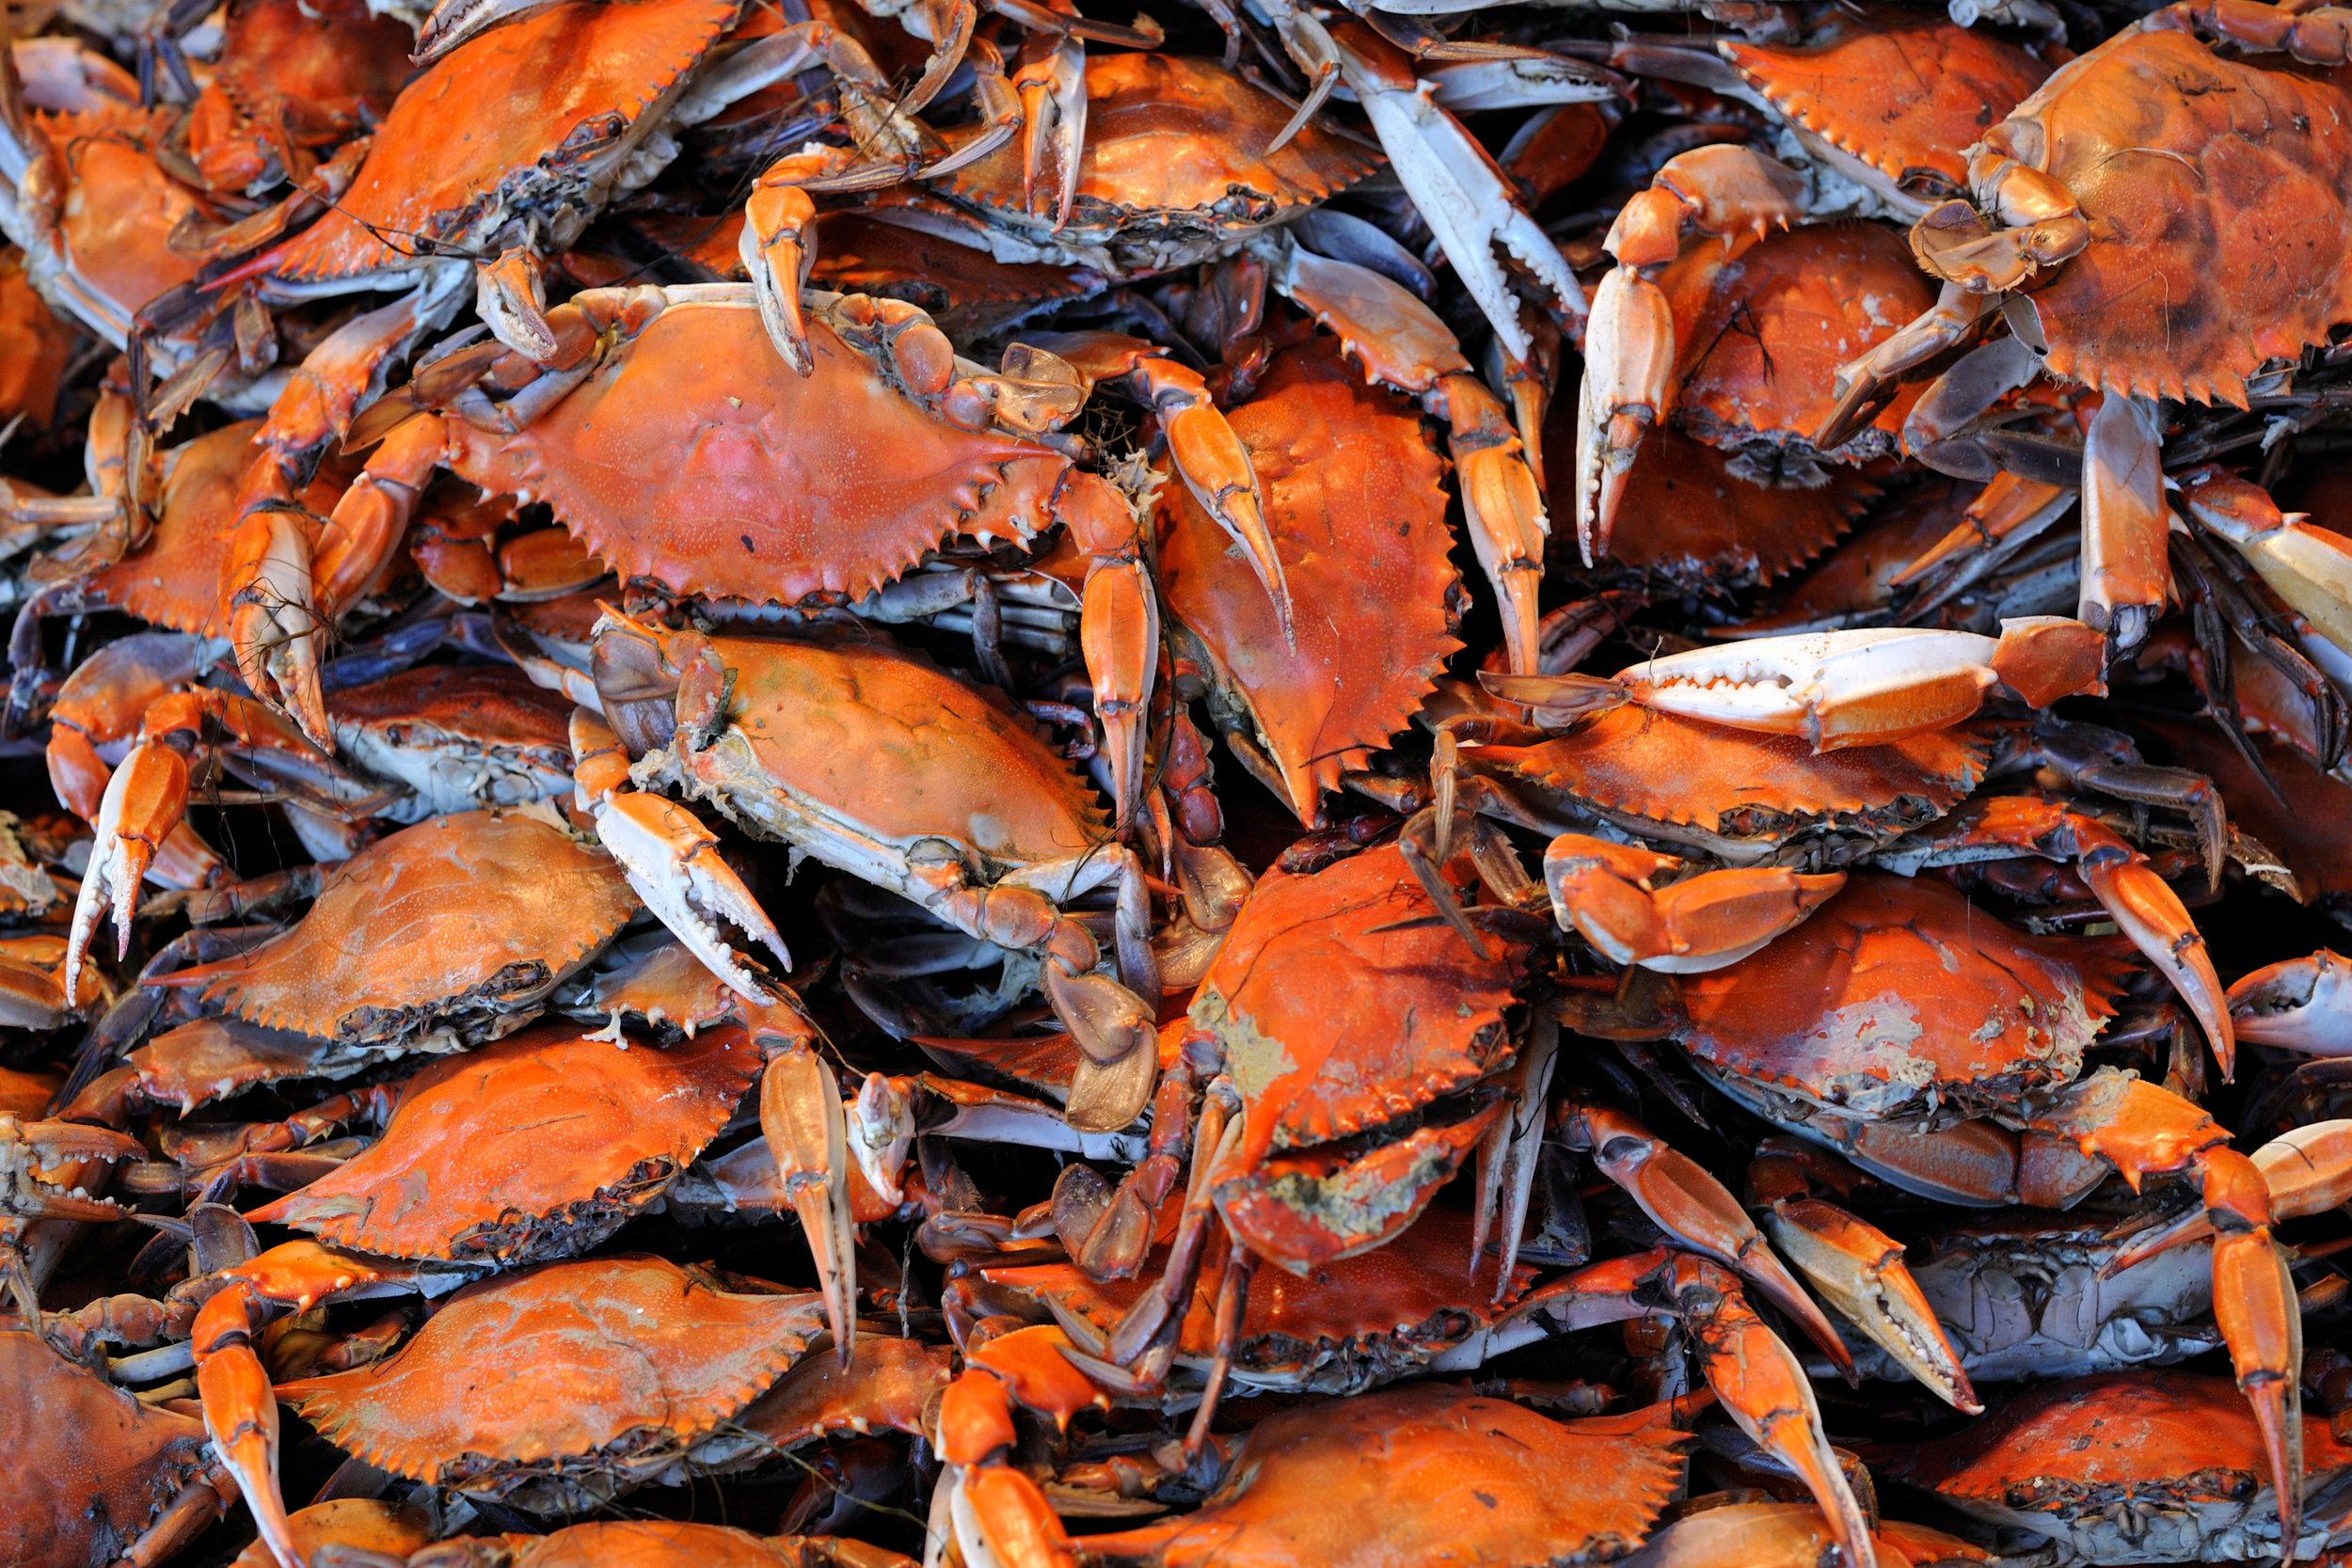 SquarespaceImage19-marinefisheries-crabs.jpg